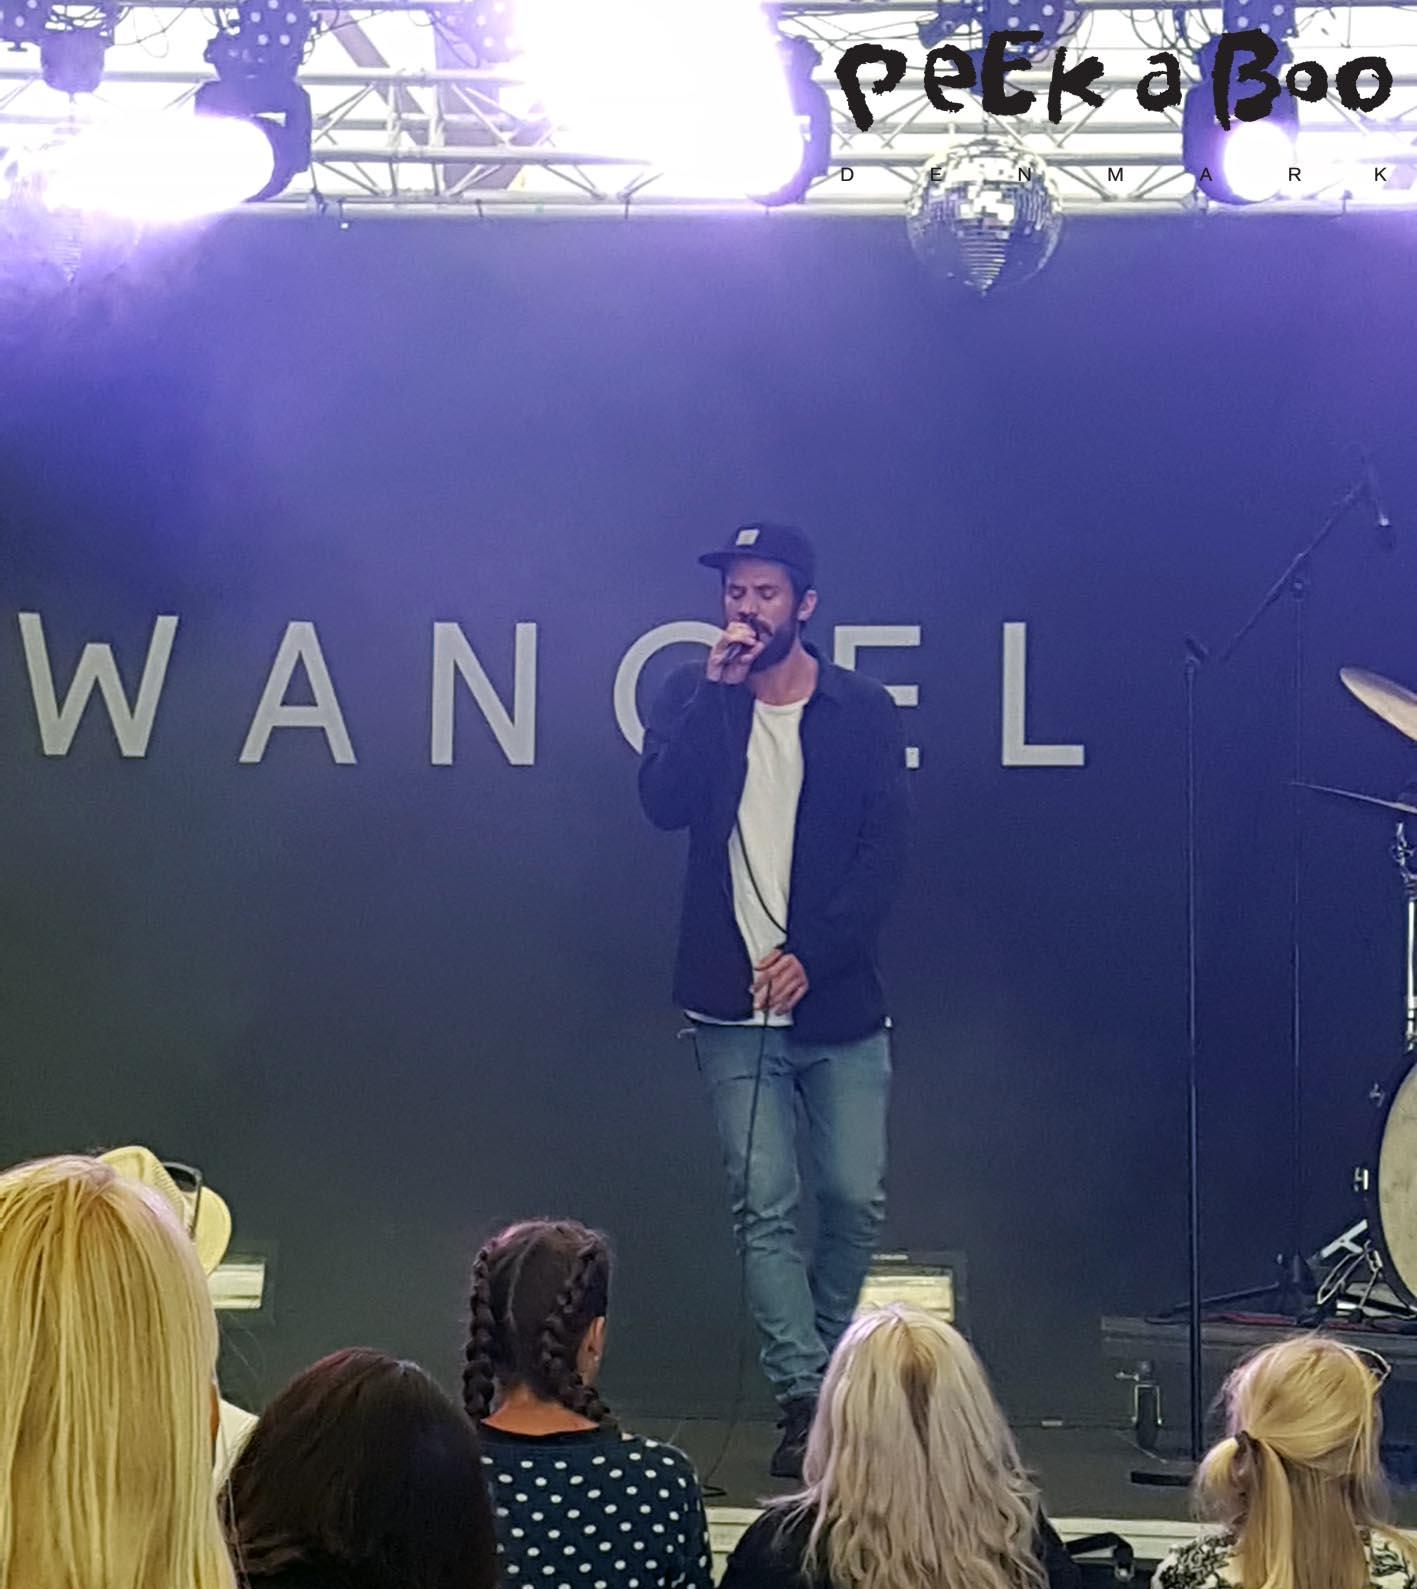 Wangel at Vig festival 2016